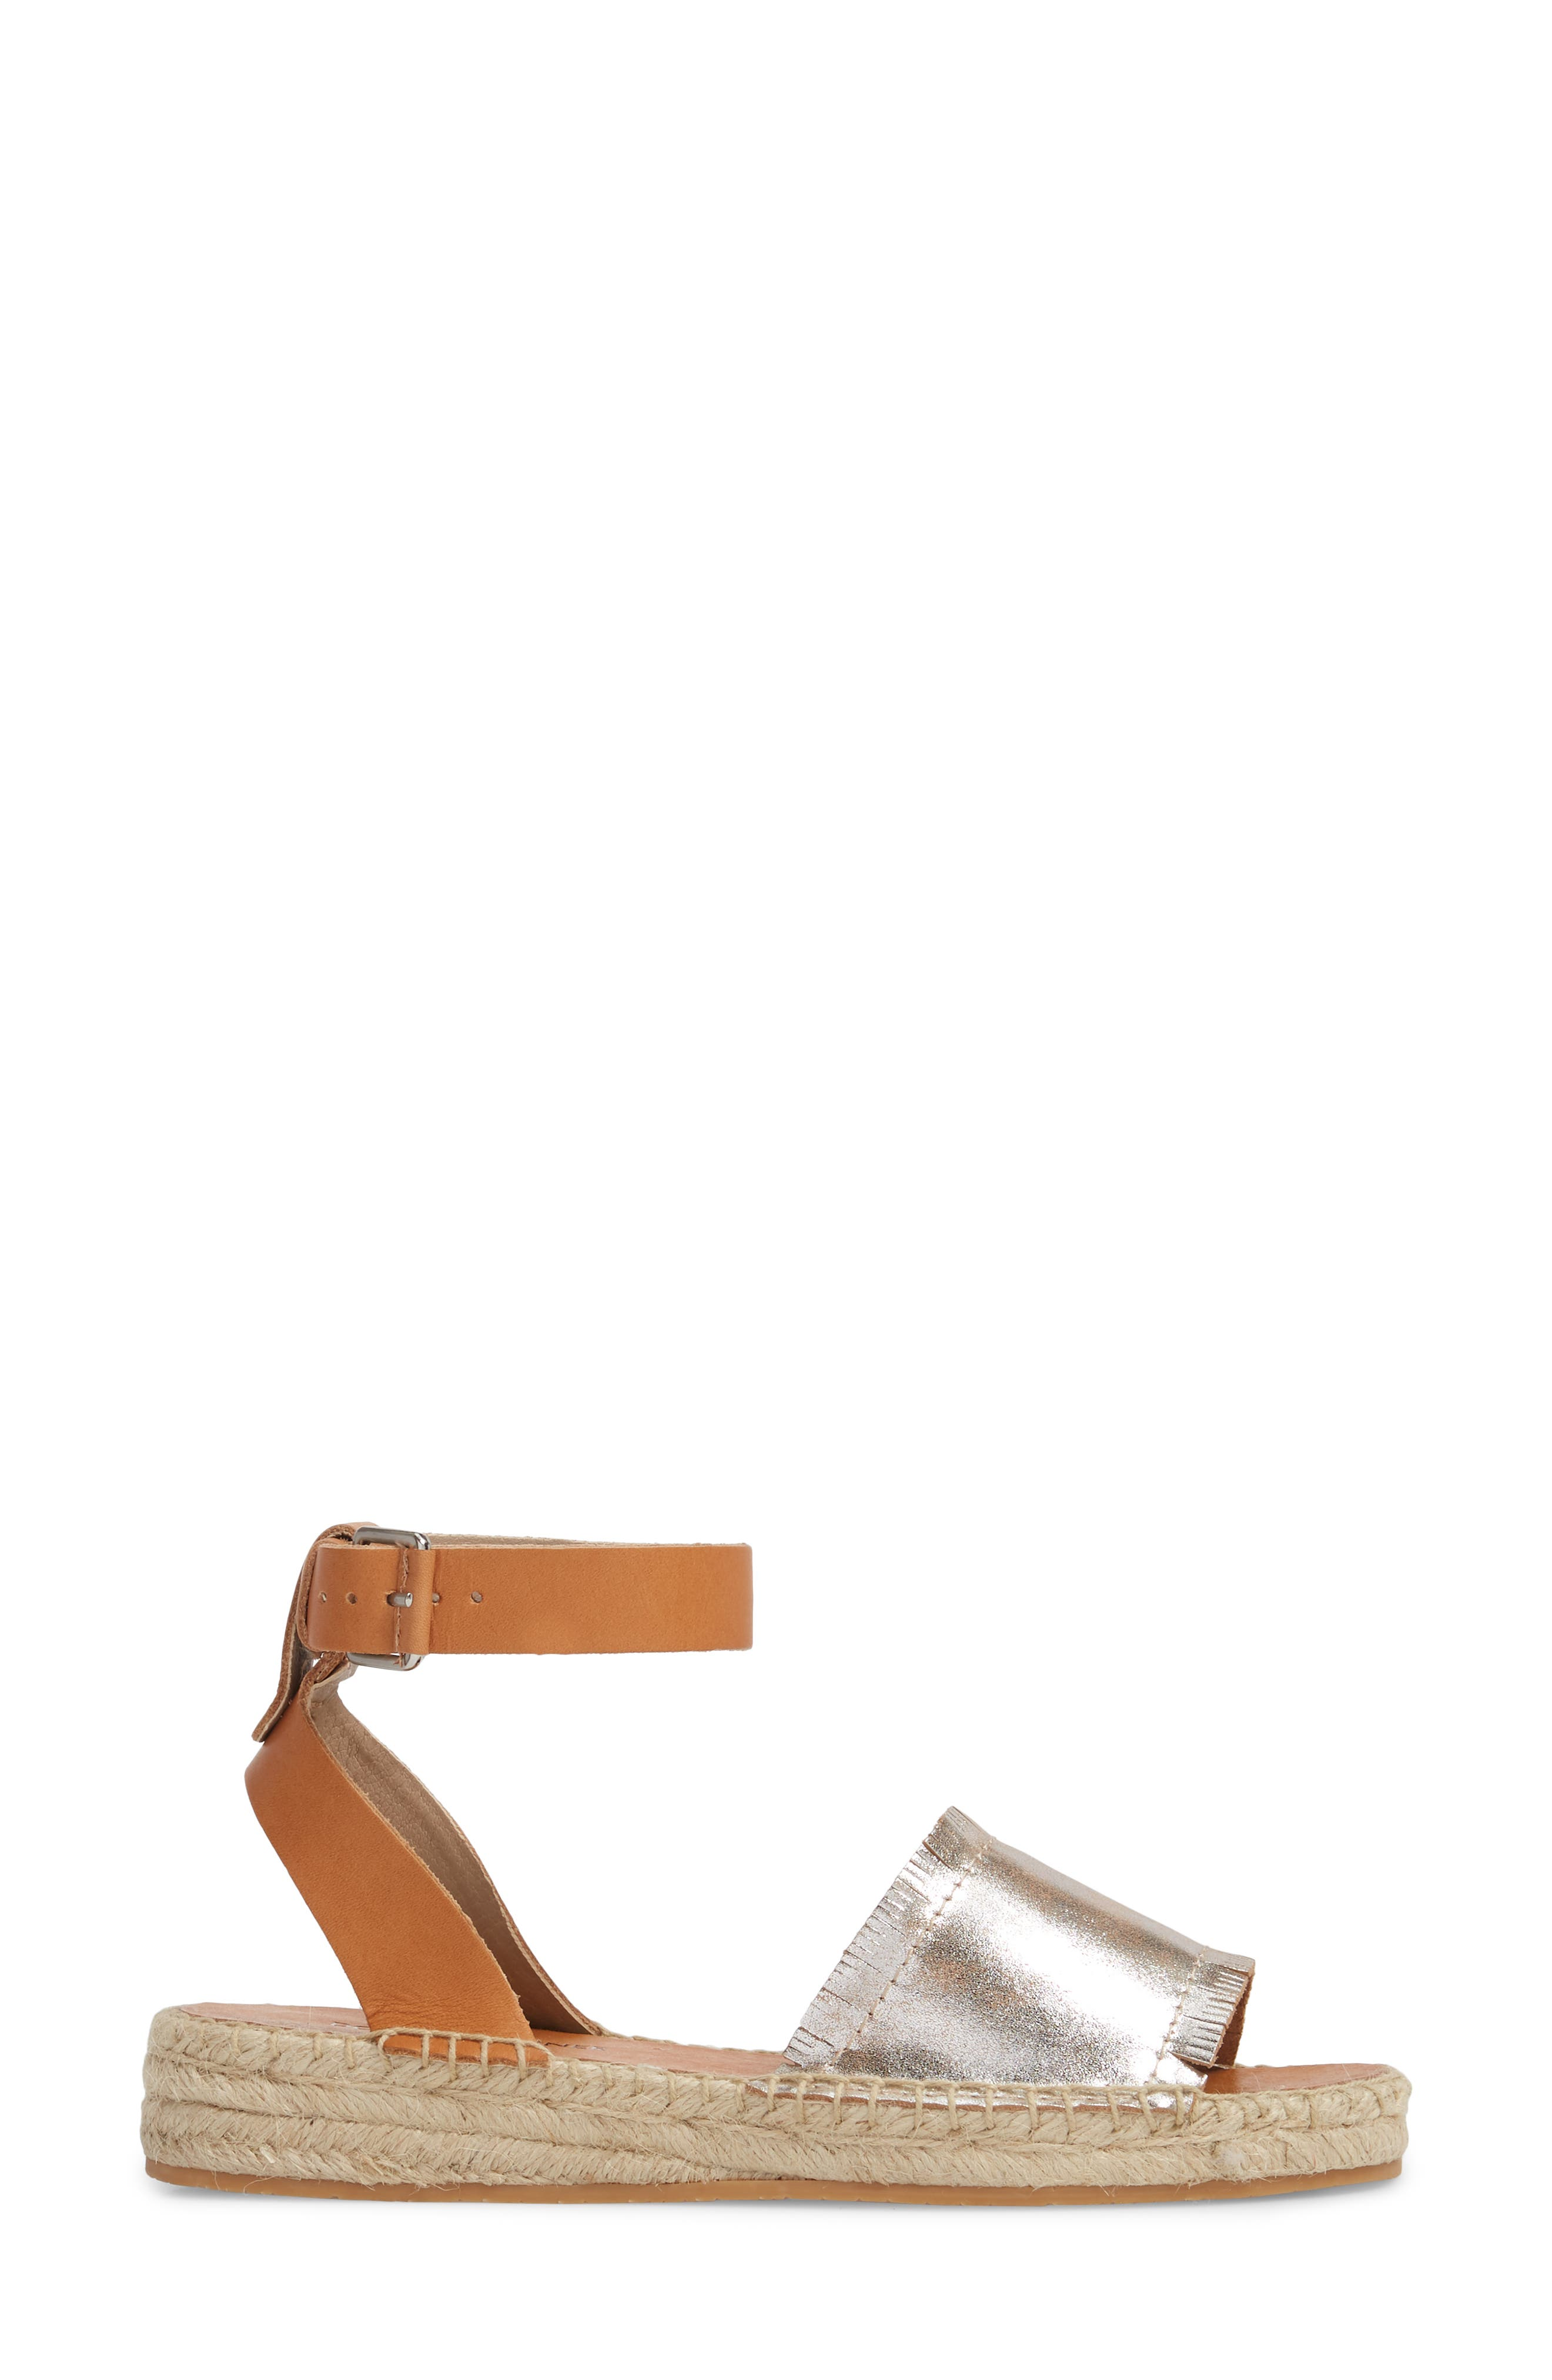 Rowen Espadrille Sandal,                             Alternate thumbnail 3, color,                             041